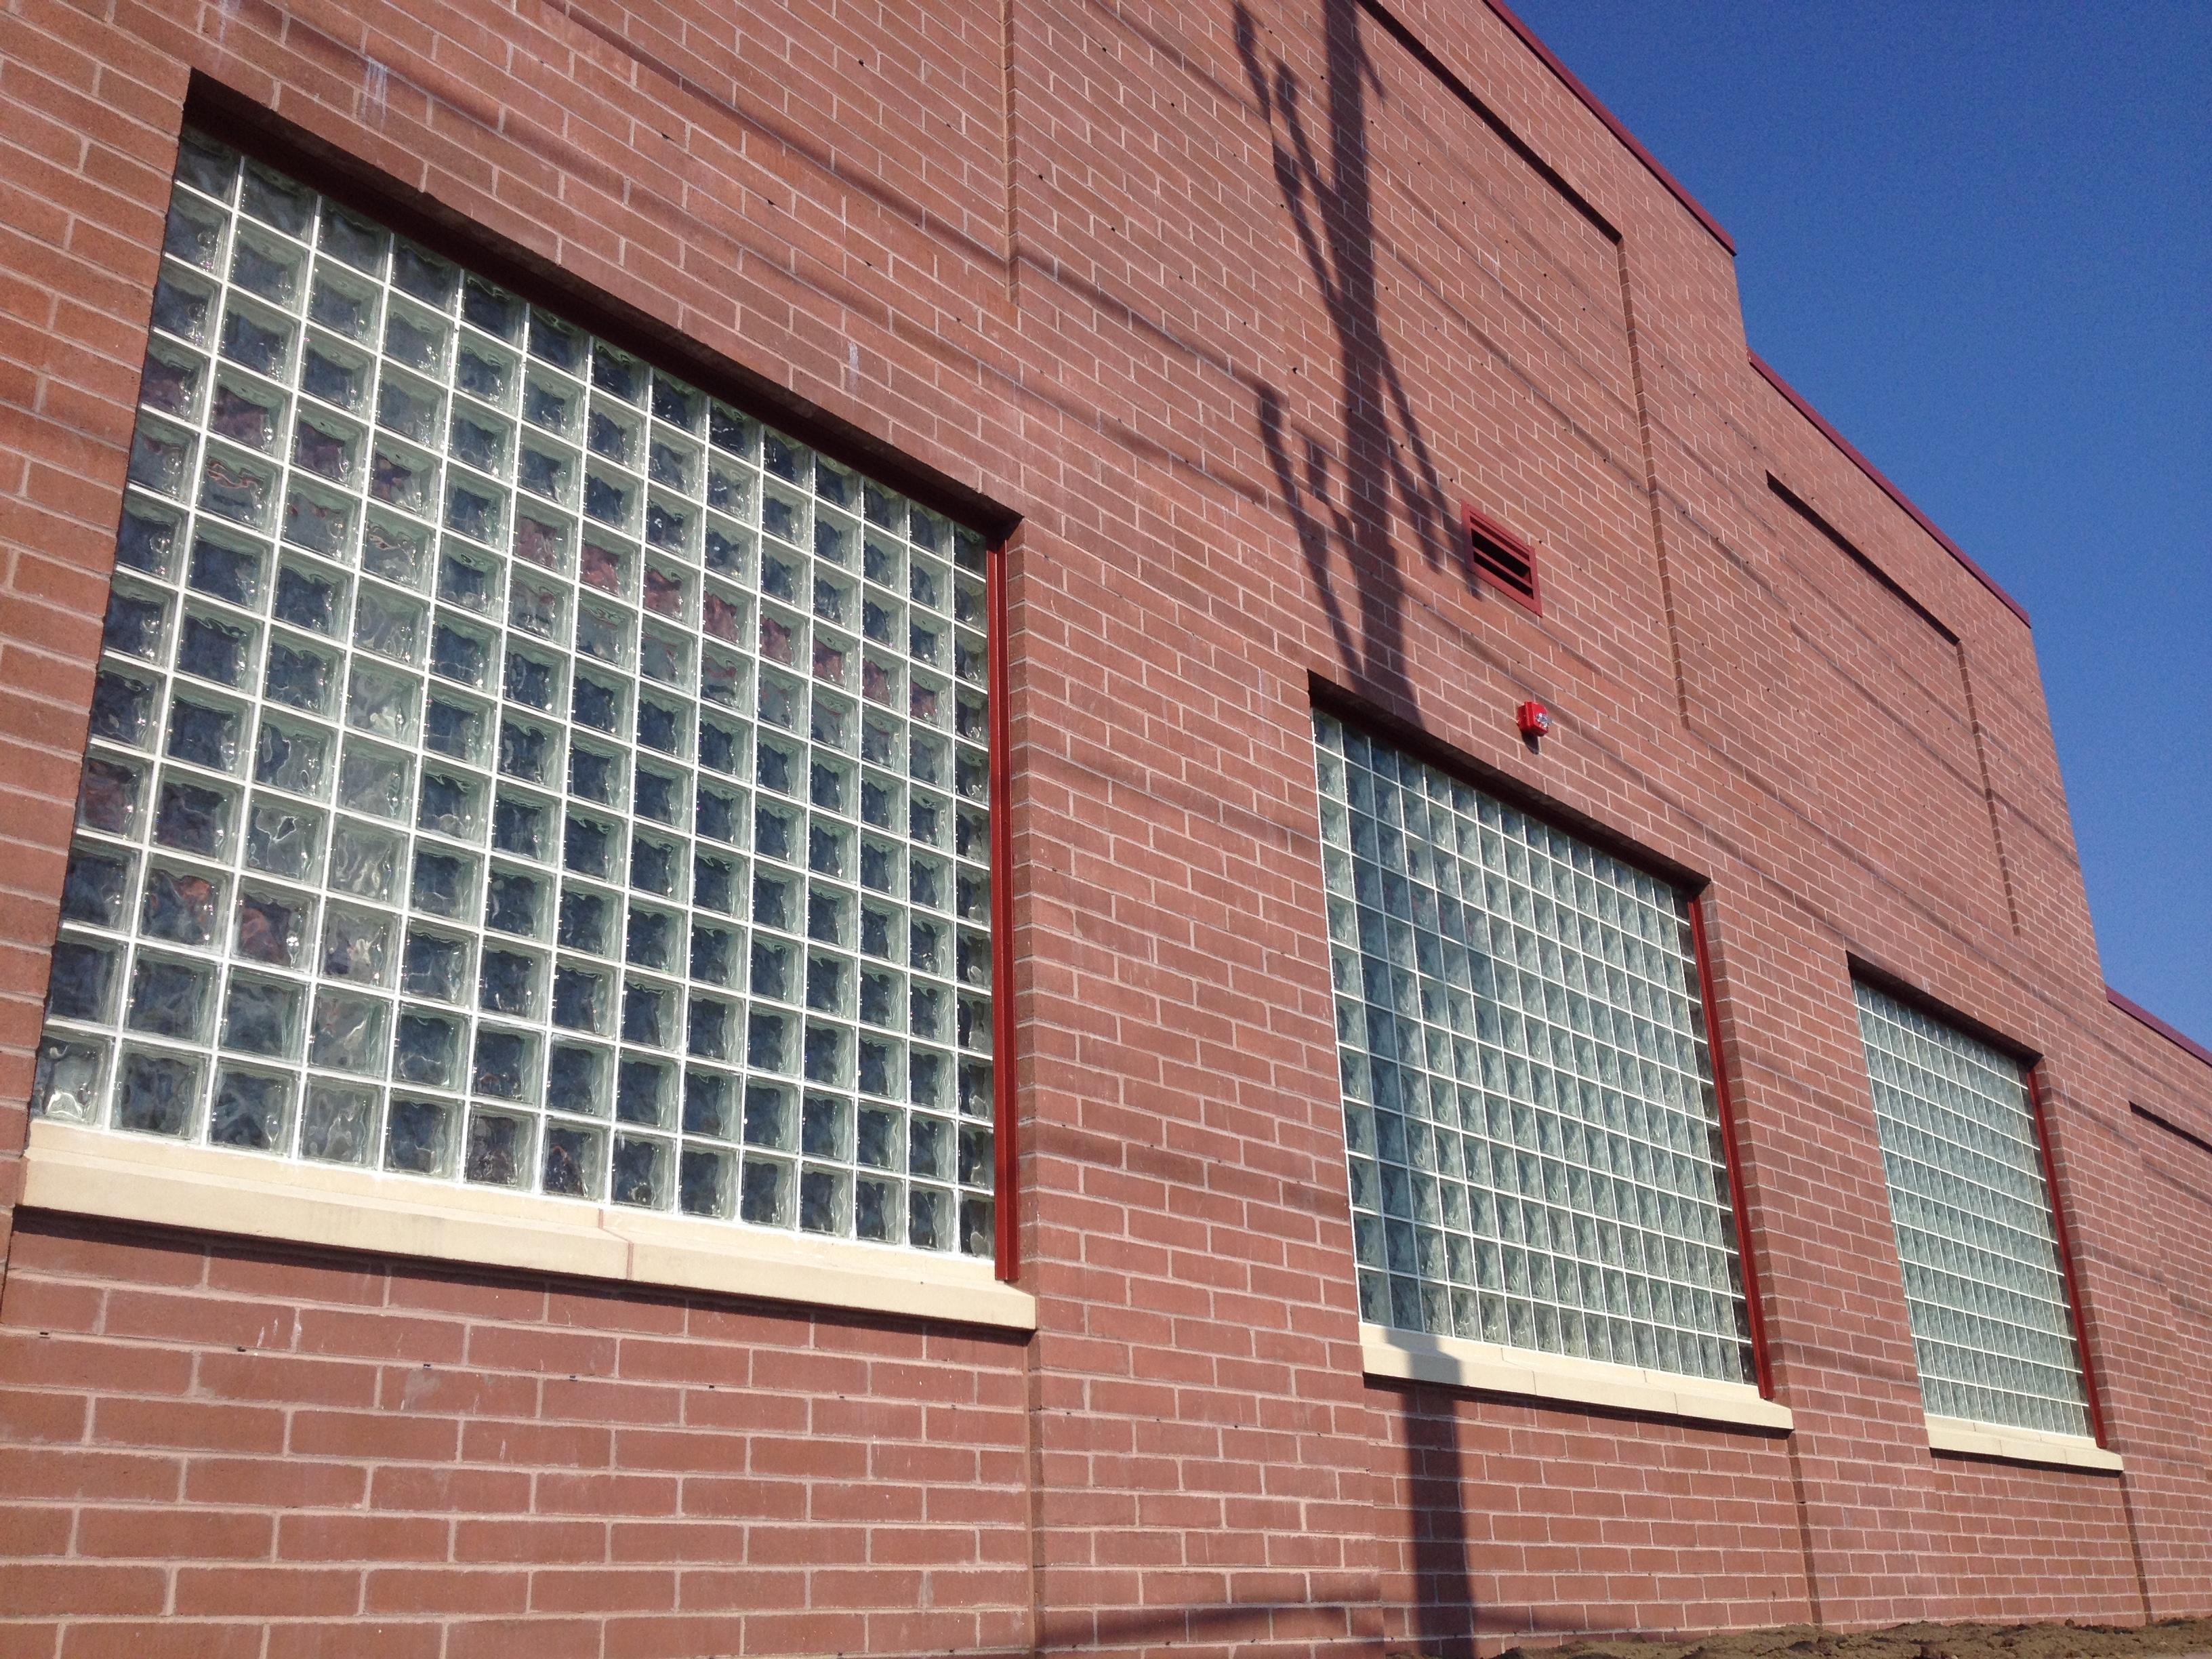 Fire Rated Glass Blocks Sydney